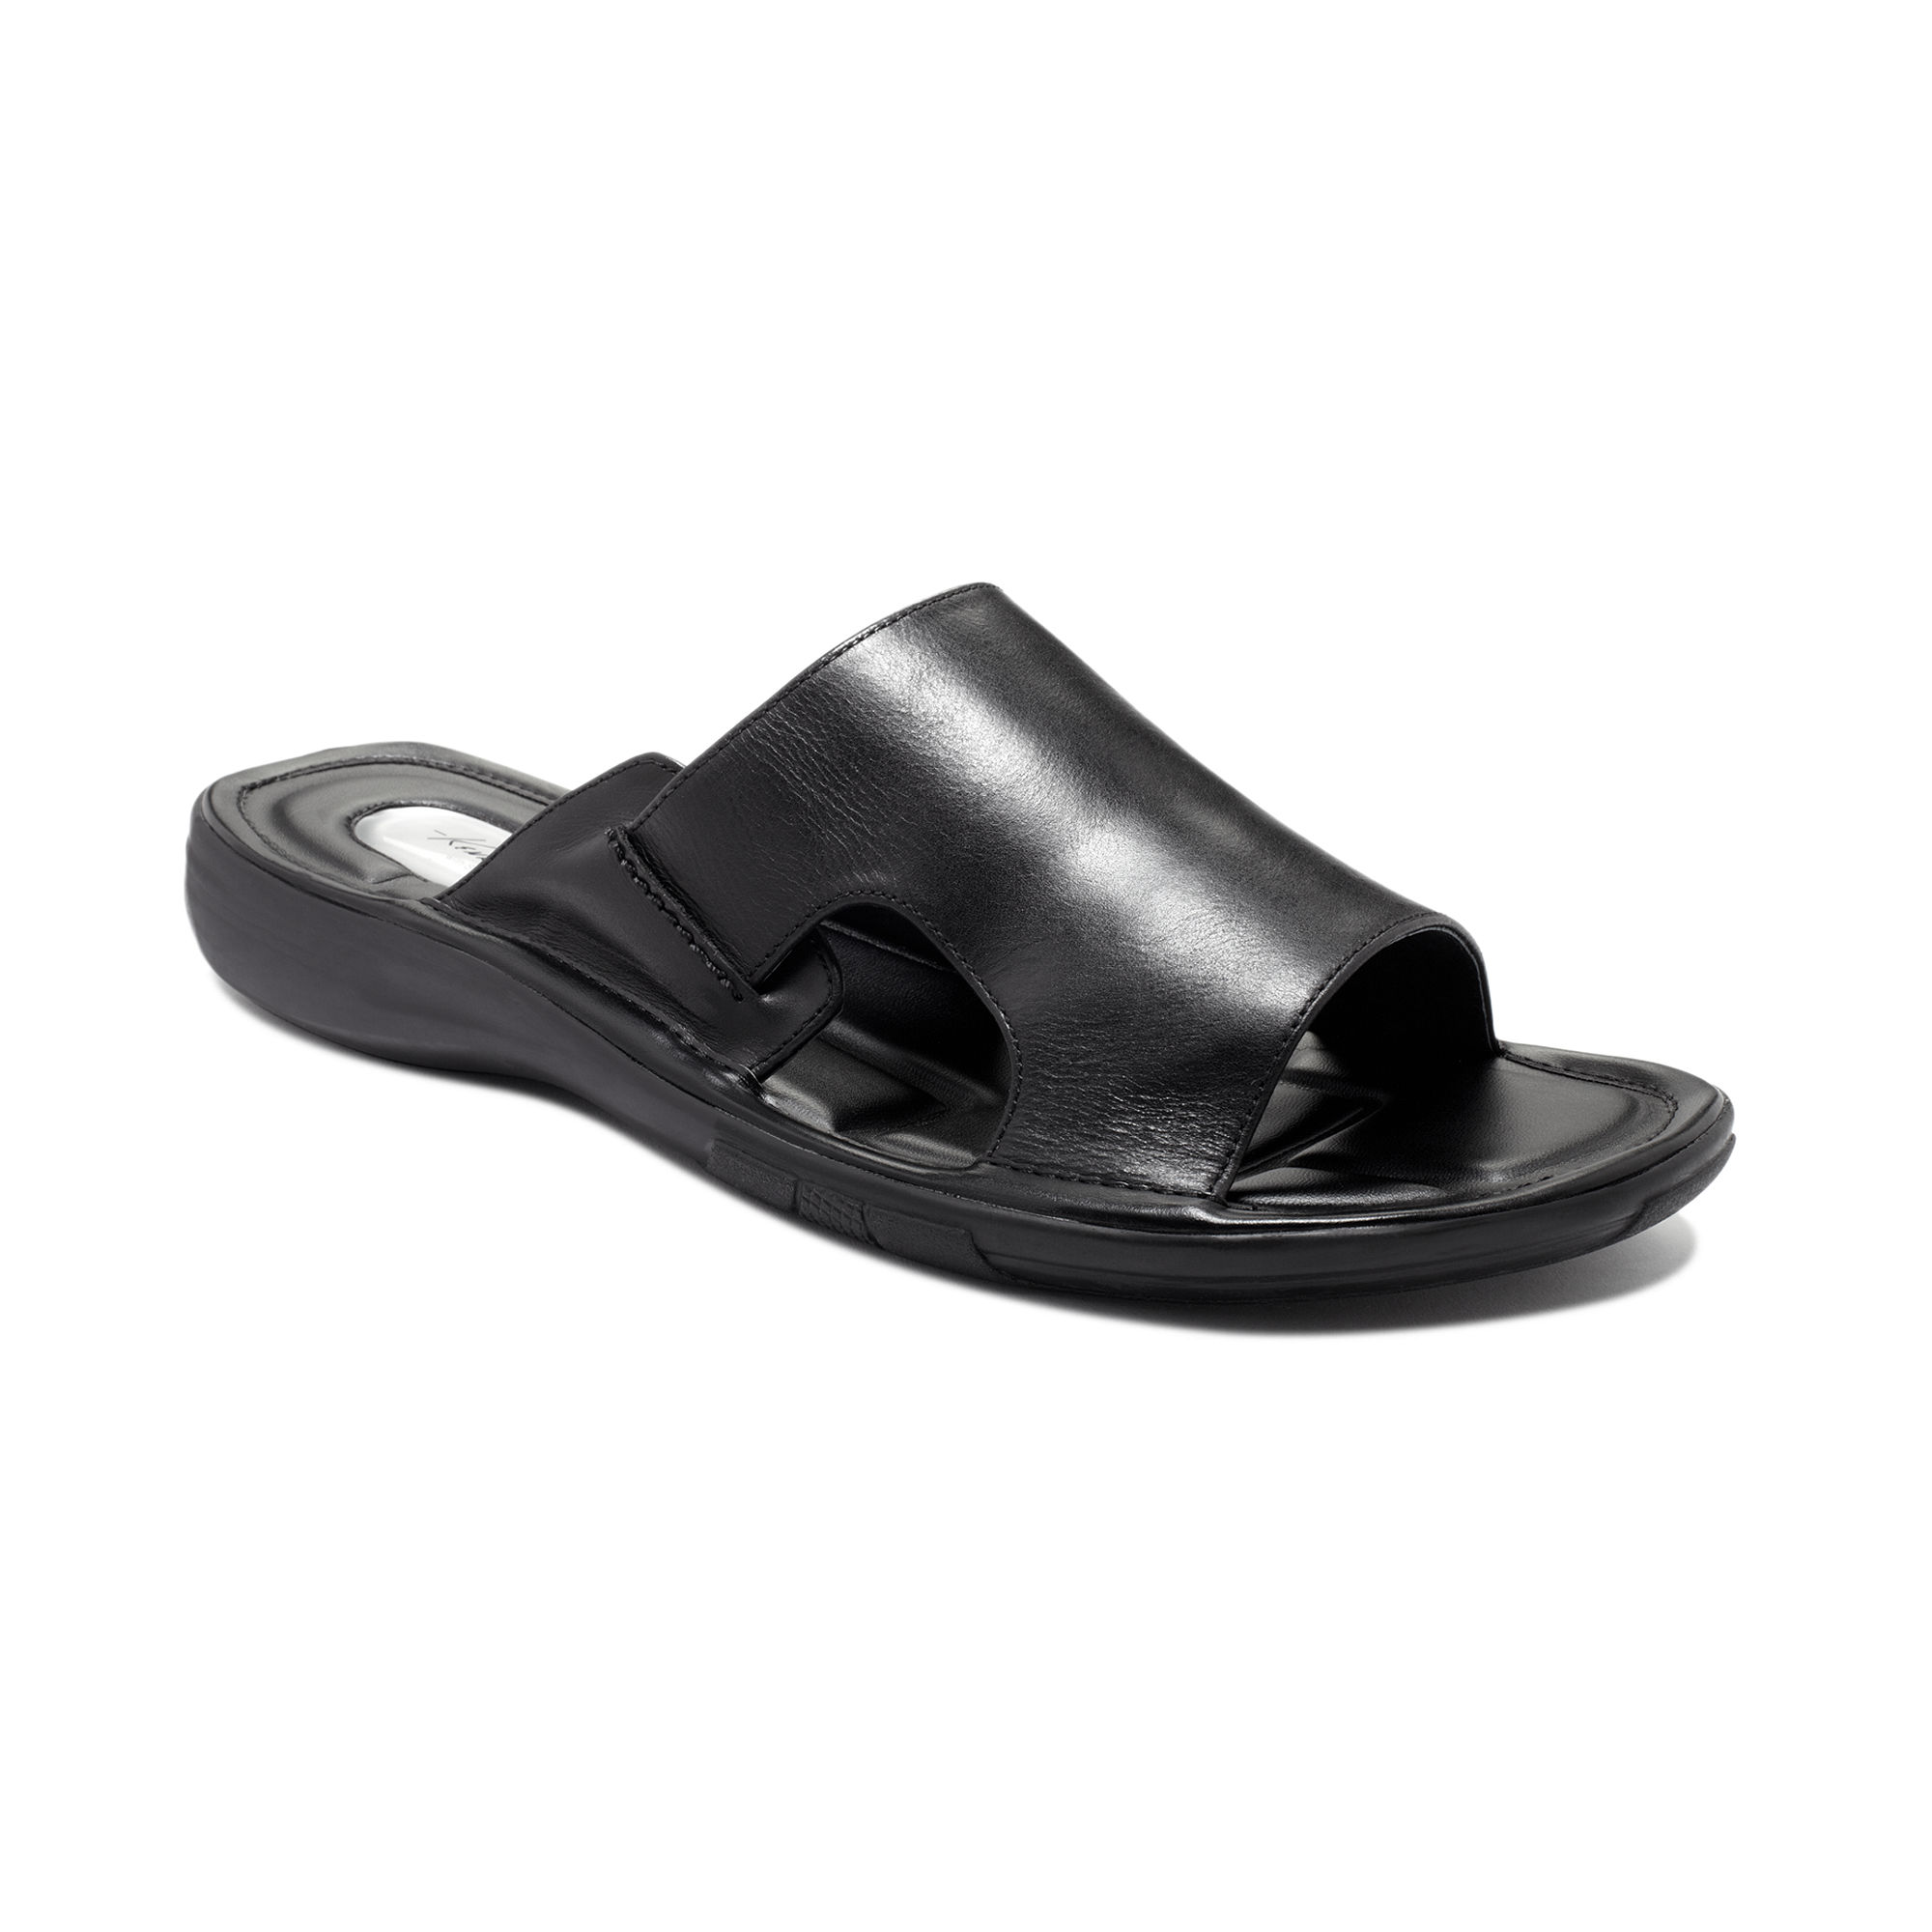 362f248af1ab Lyst kenneth cole final stretch sandals in black for men jpg 2000x2000 Kenneth  cole mens sandals